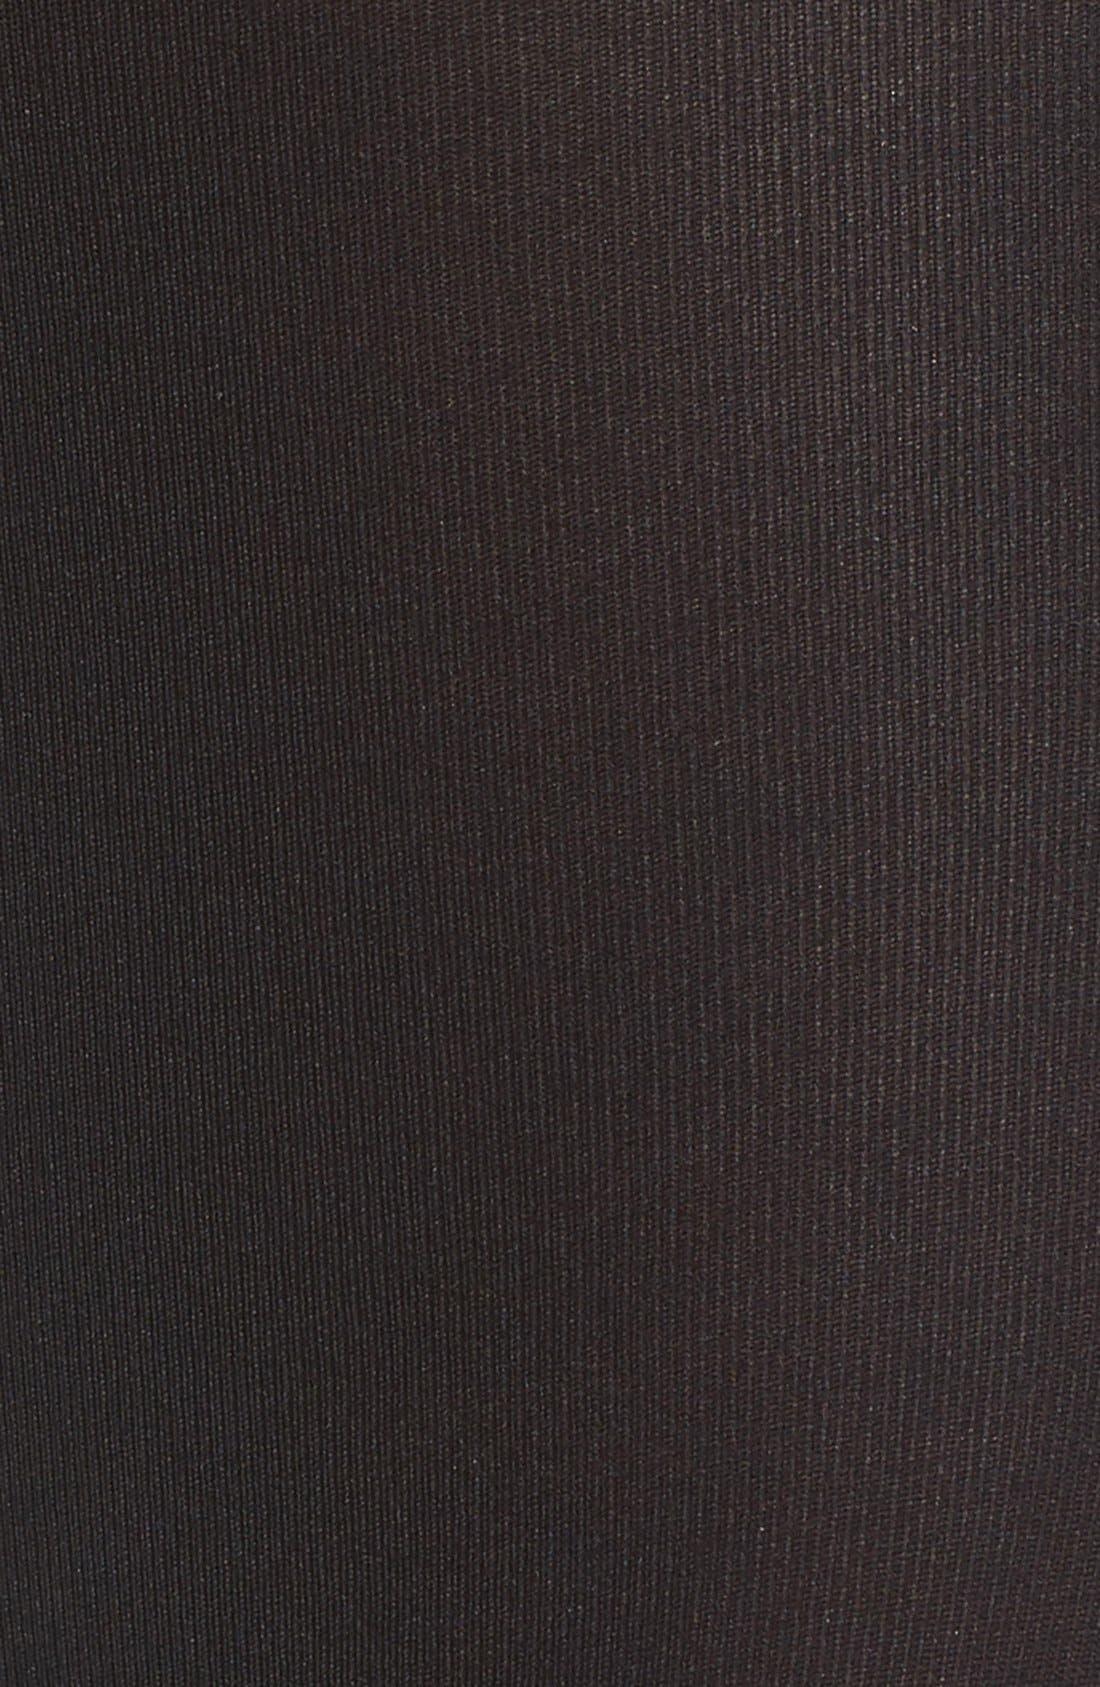 Matte Opaque Tights,                             Alternate thumbnail 2, color,                             BLACK